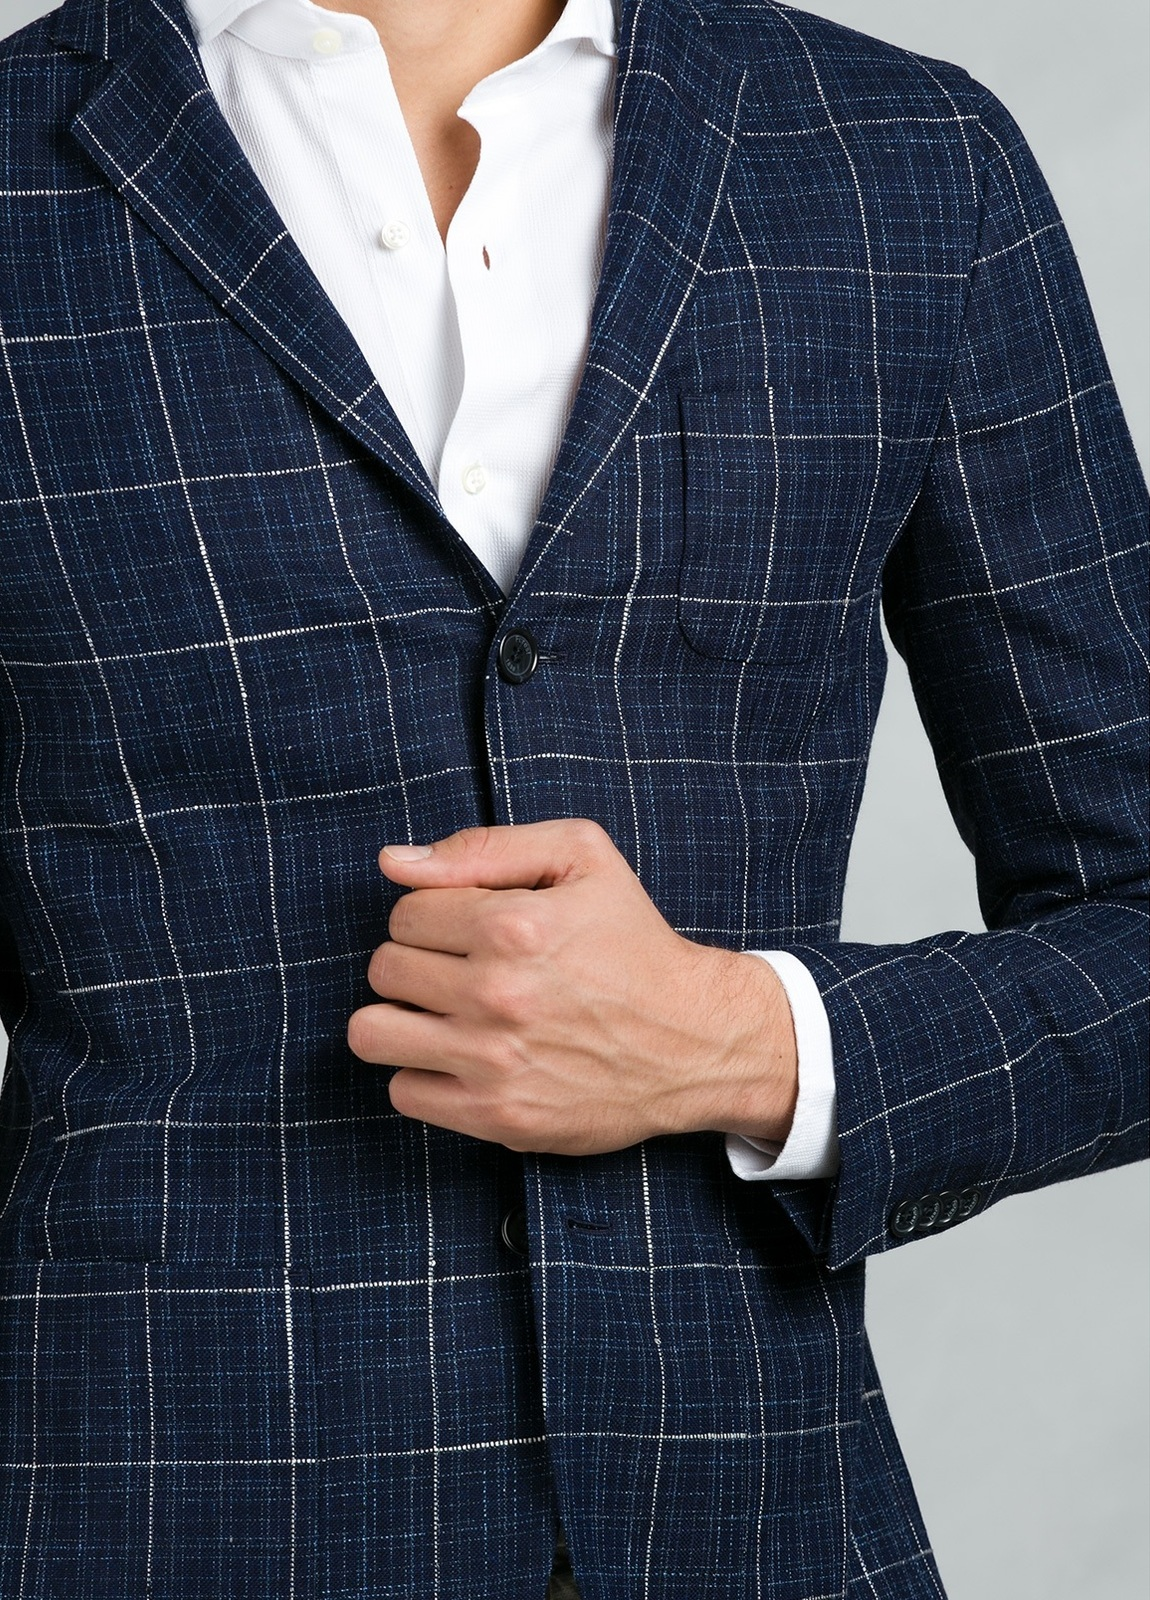 Americana SOFT JACKET Slim Fit con diseño cuadro ventana color azul, 90% Viscosa 5% Lino 5% Algodón. - Ítem2